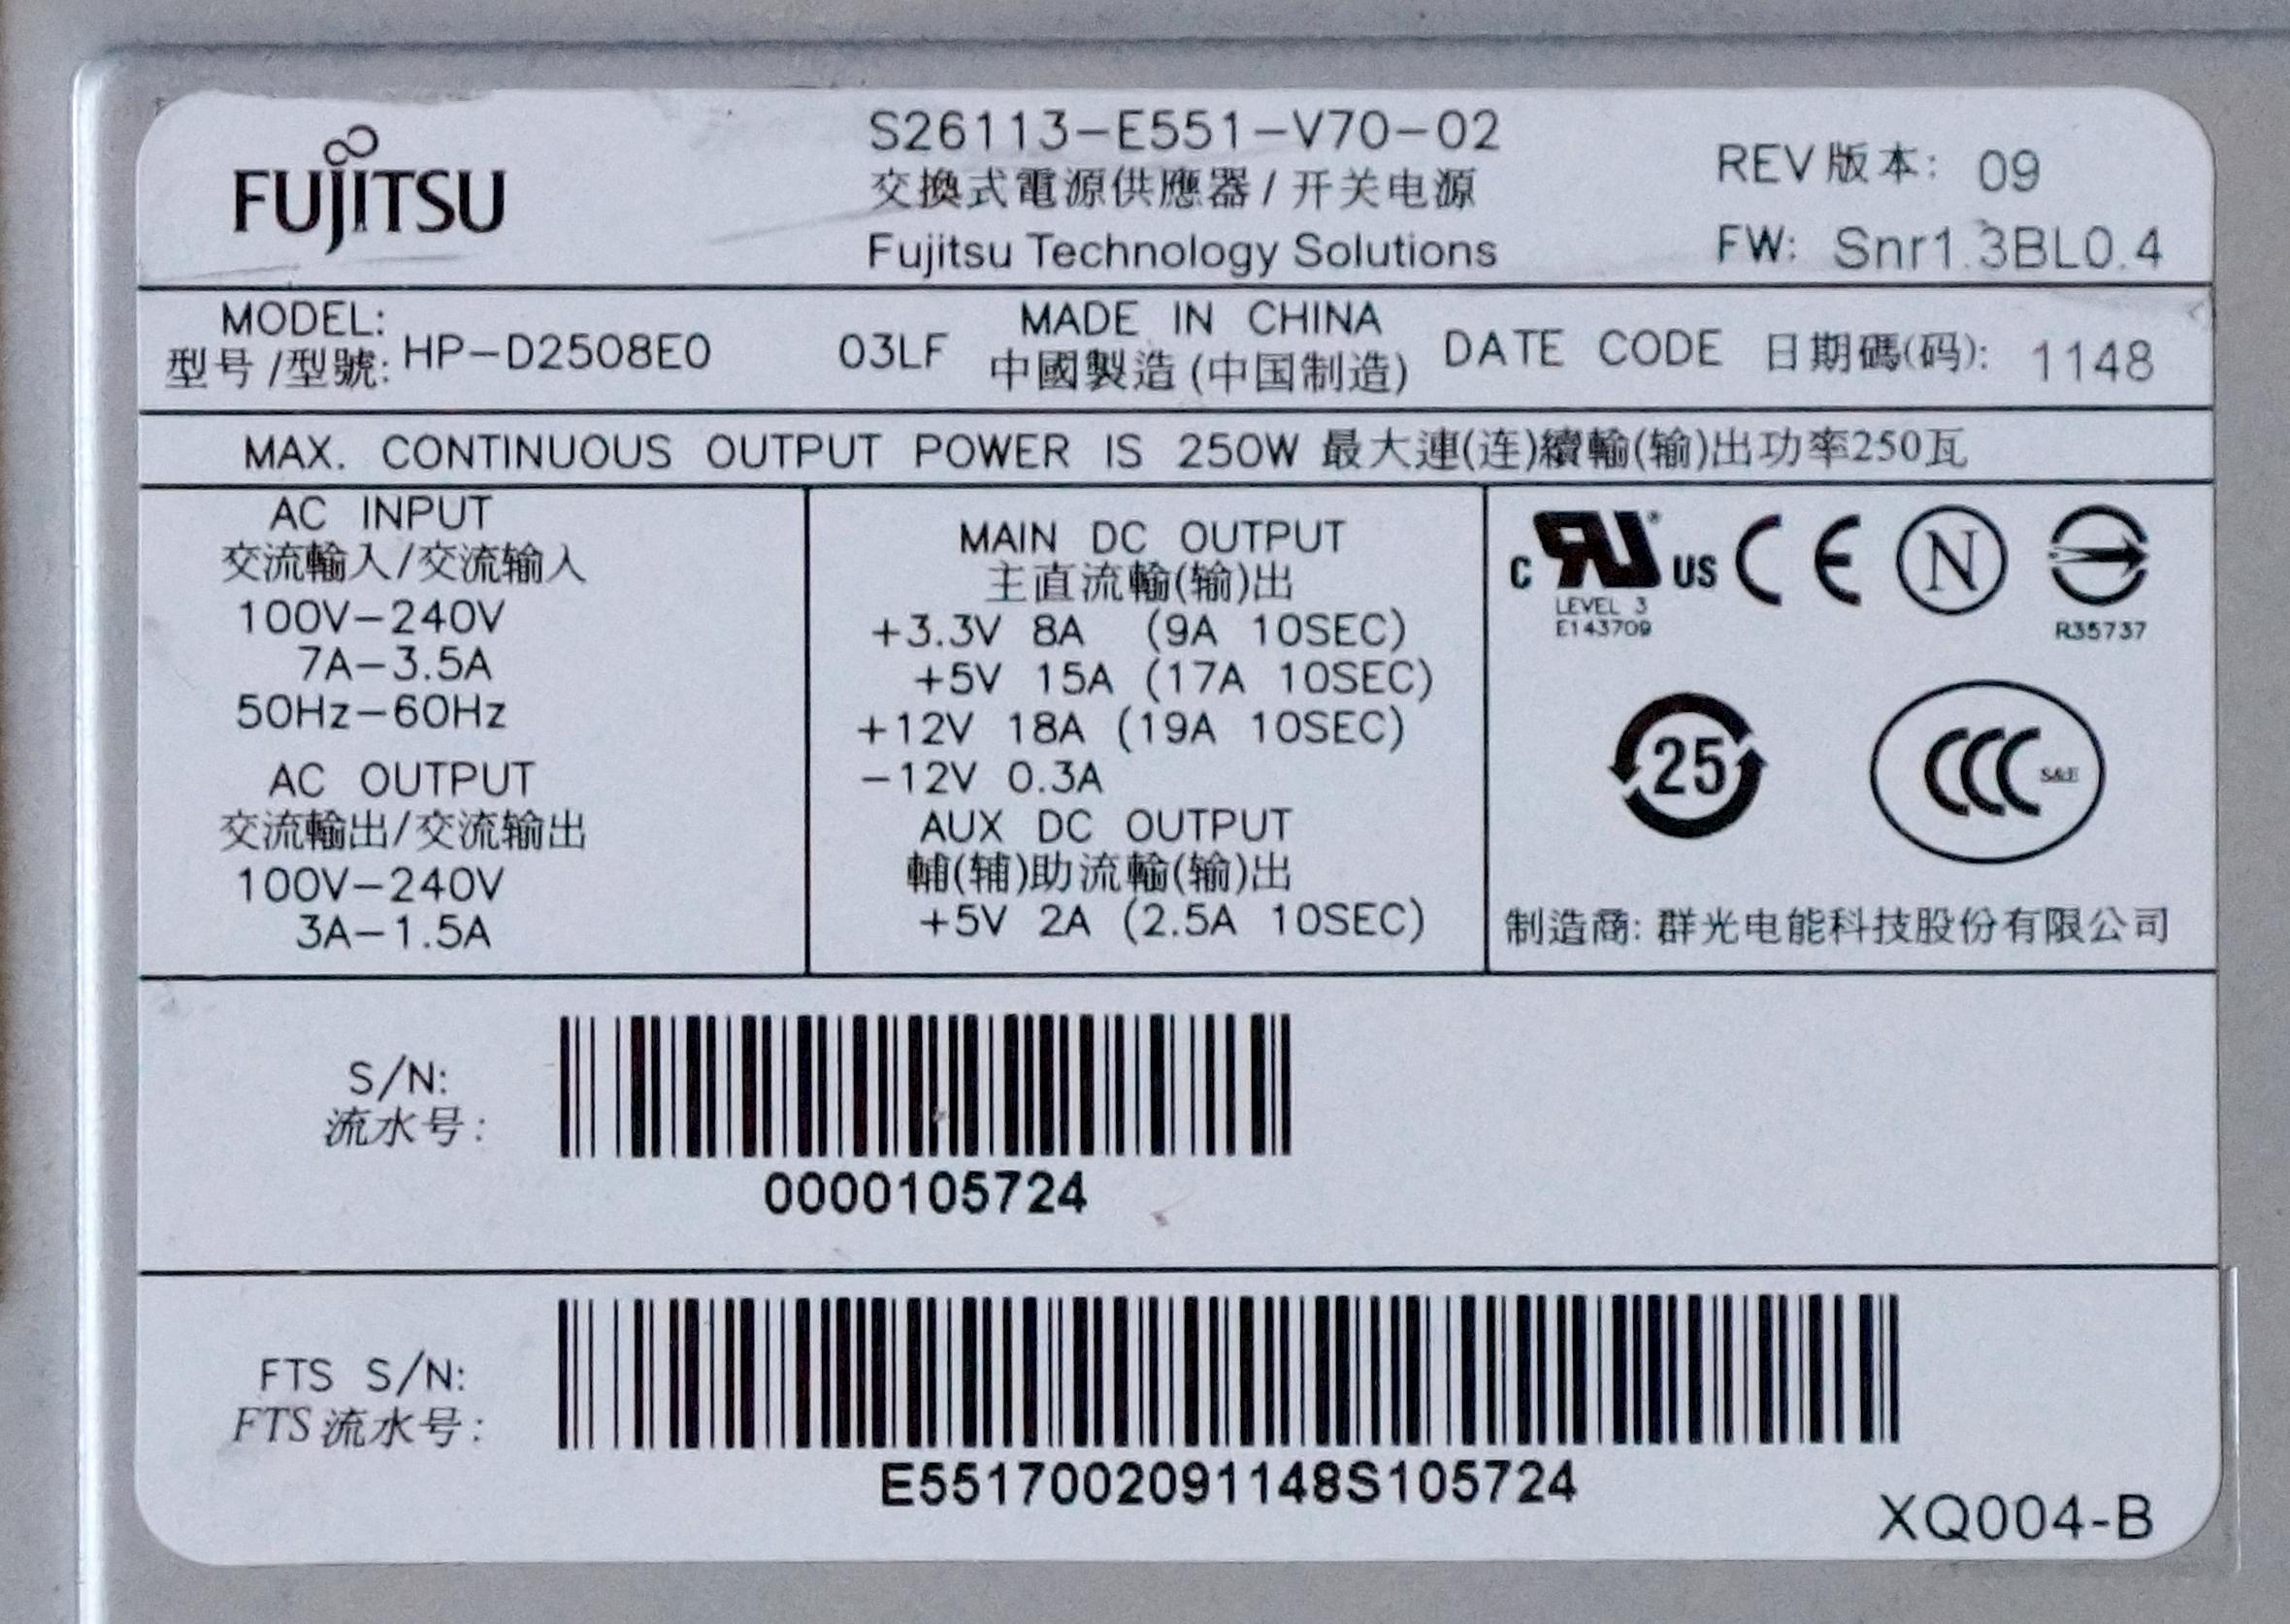 fujitsu hp d250bed 250 watt workstation alimentatore. Black Bedroom Furniture Sets. Home Design Ideas